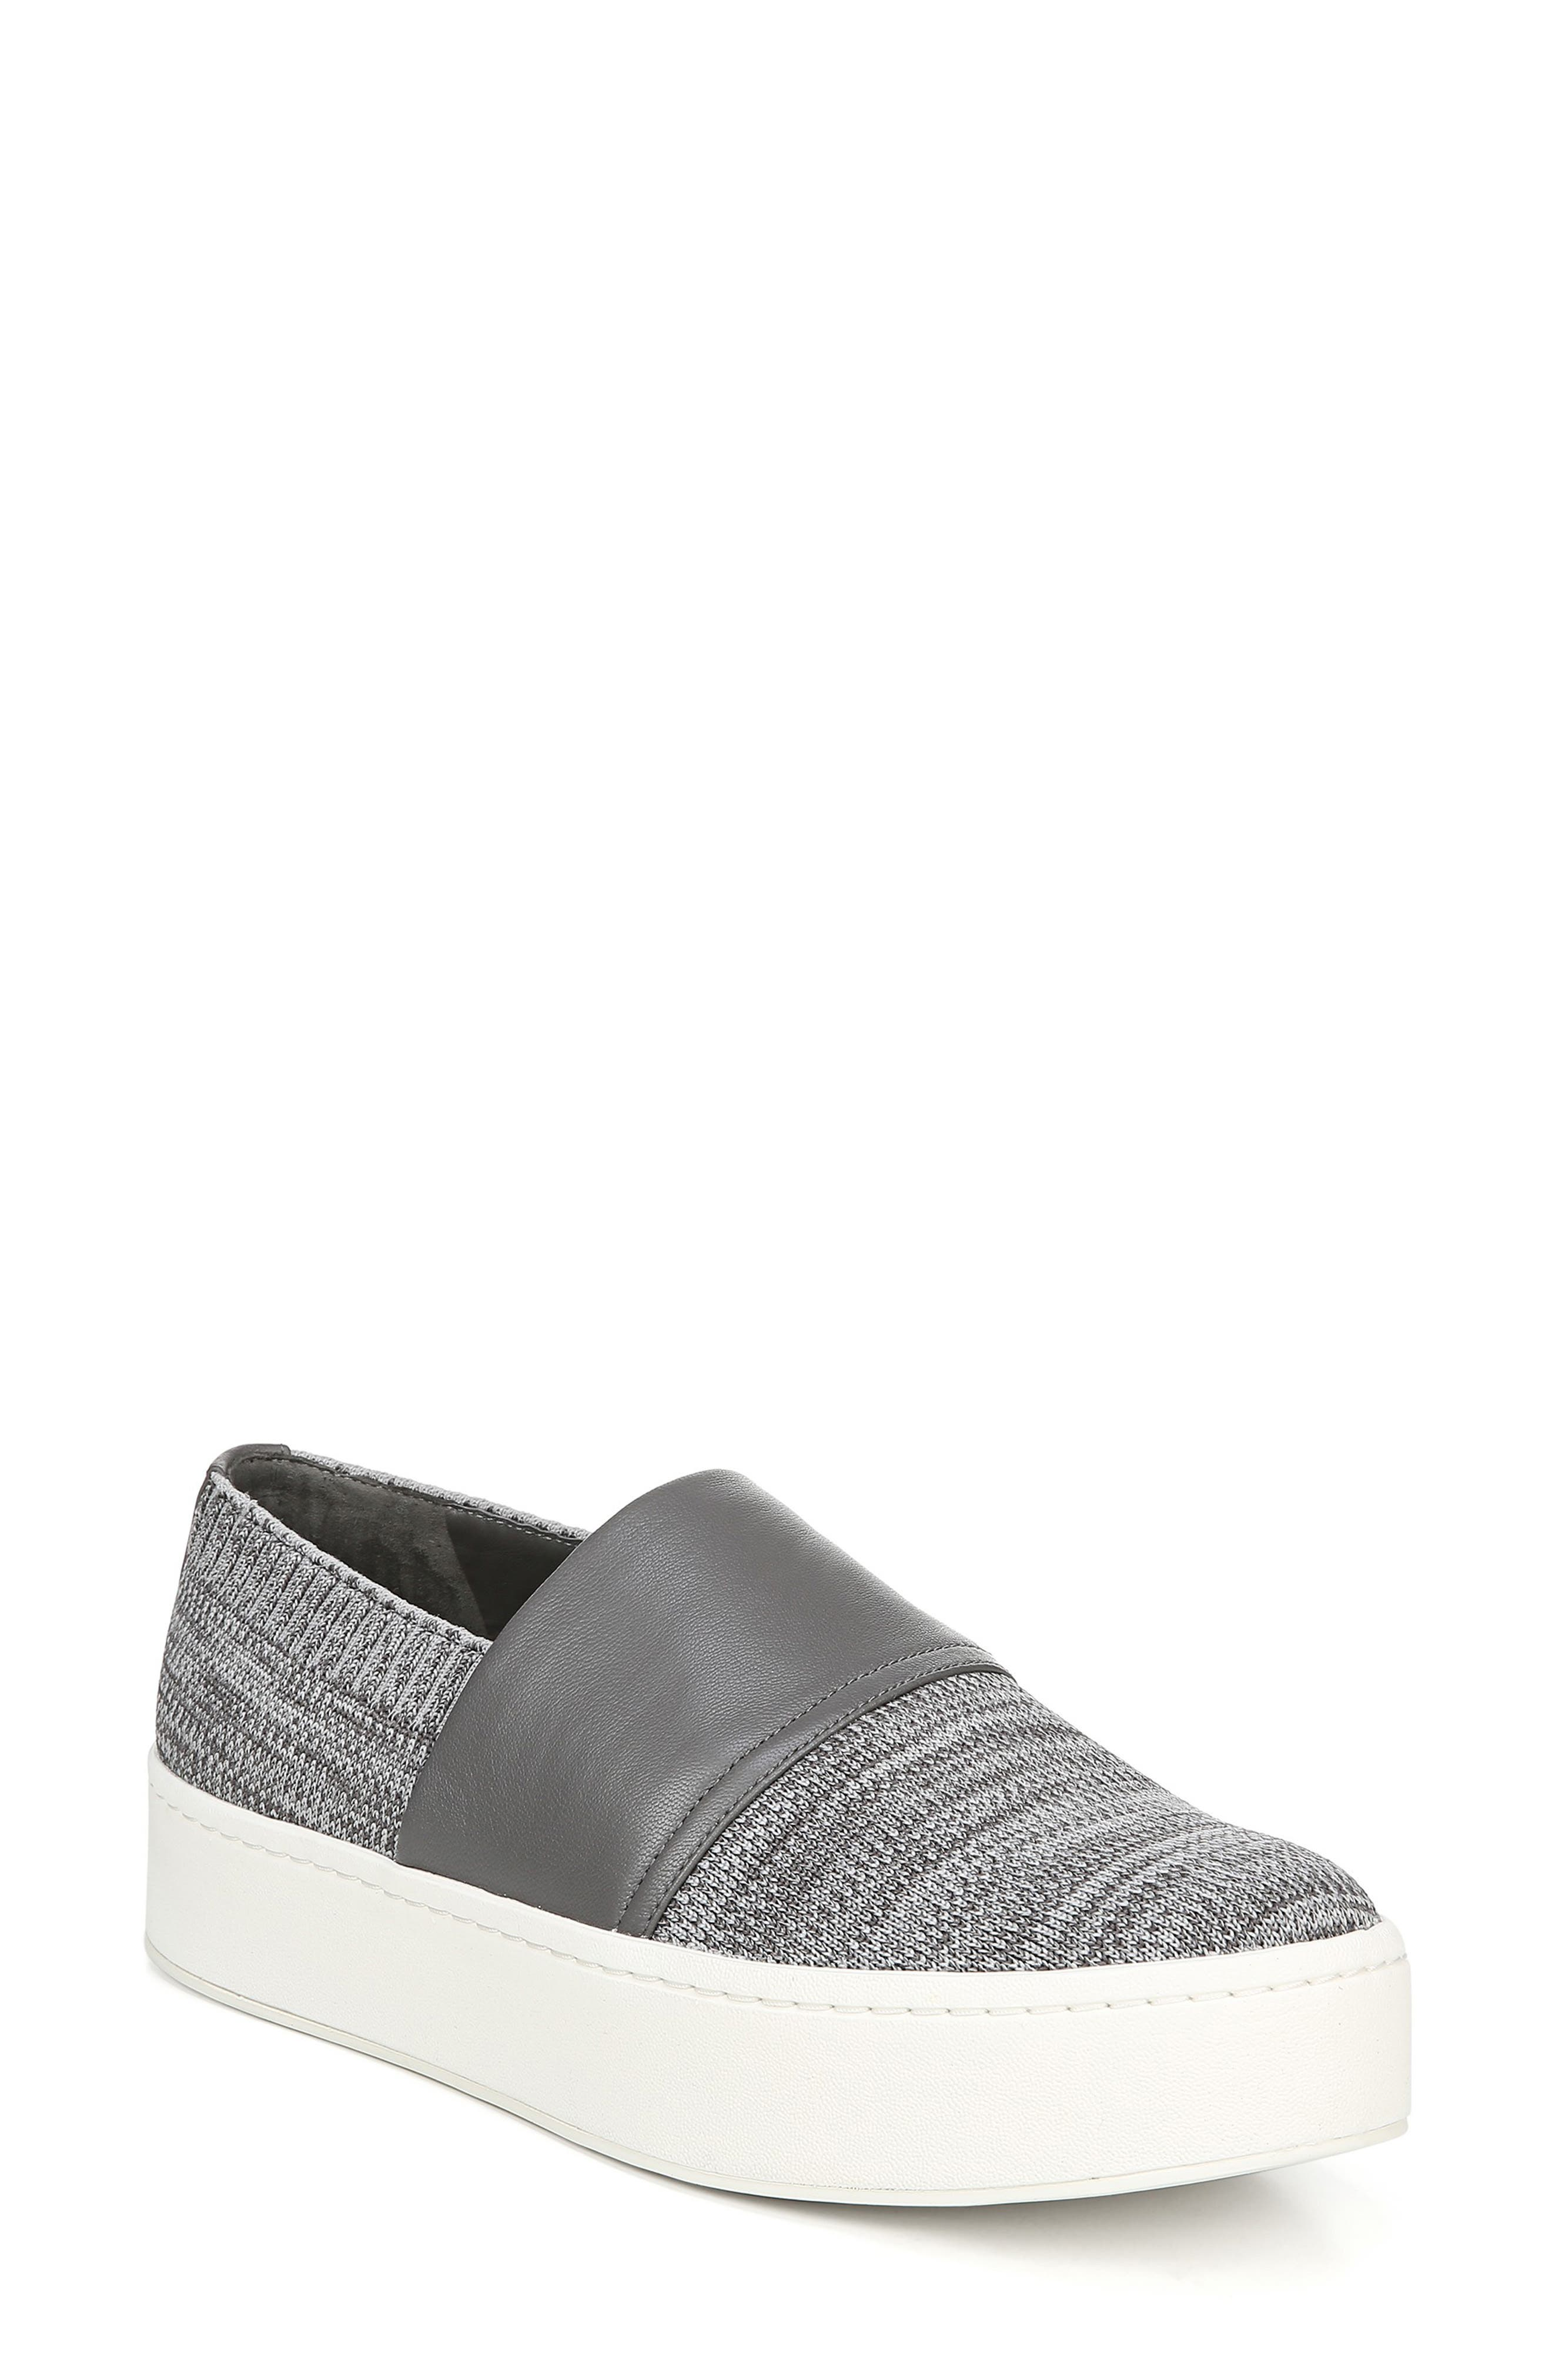 Image of Vince Ward Knit Slip-On Sneaker